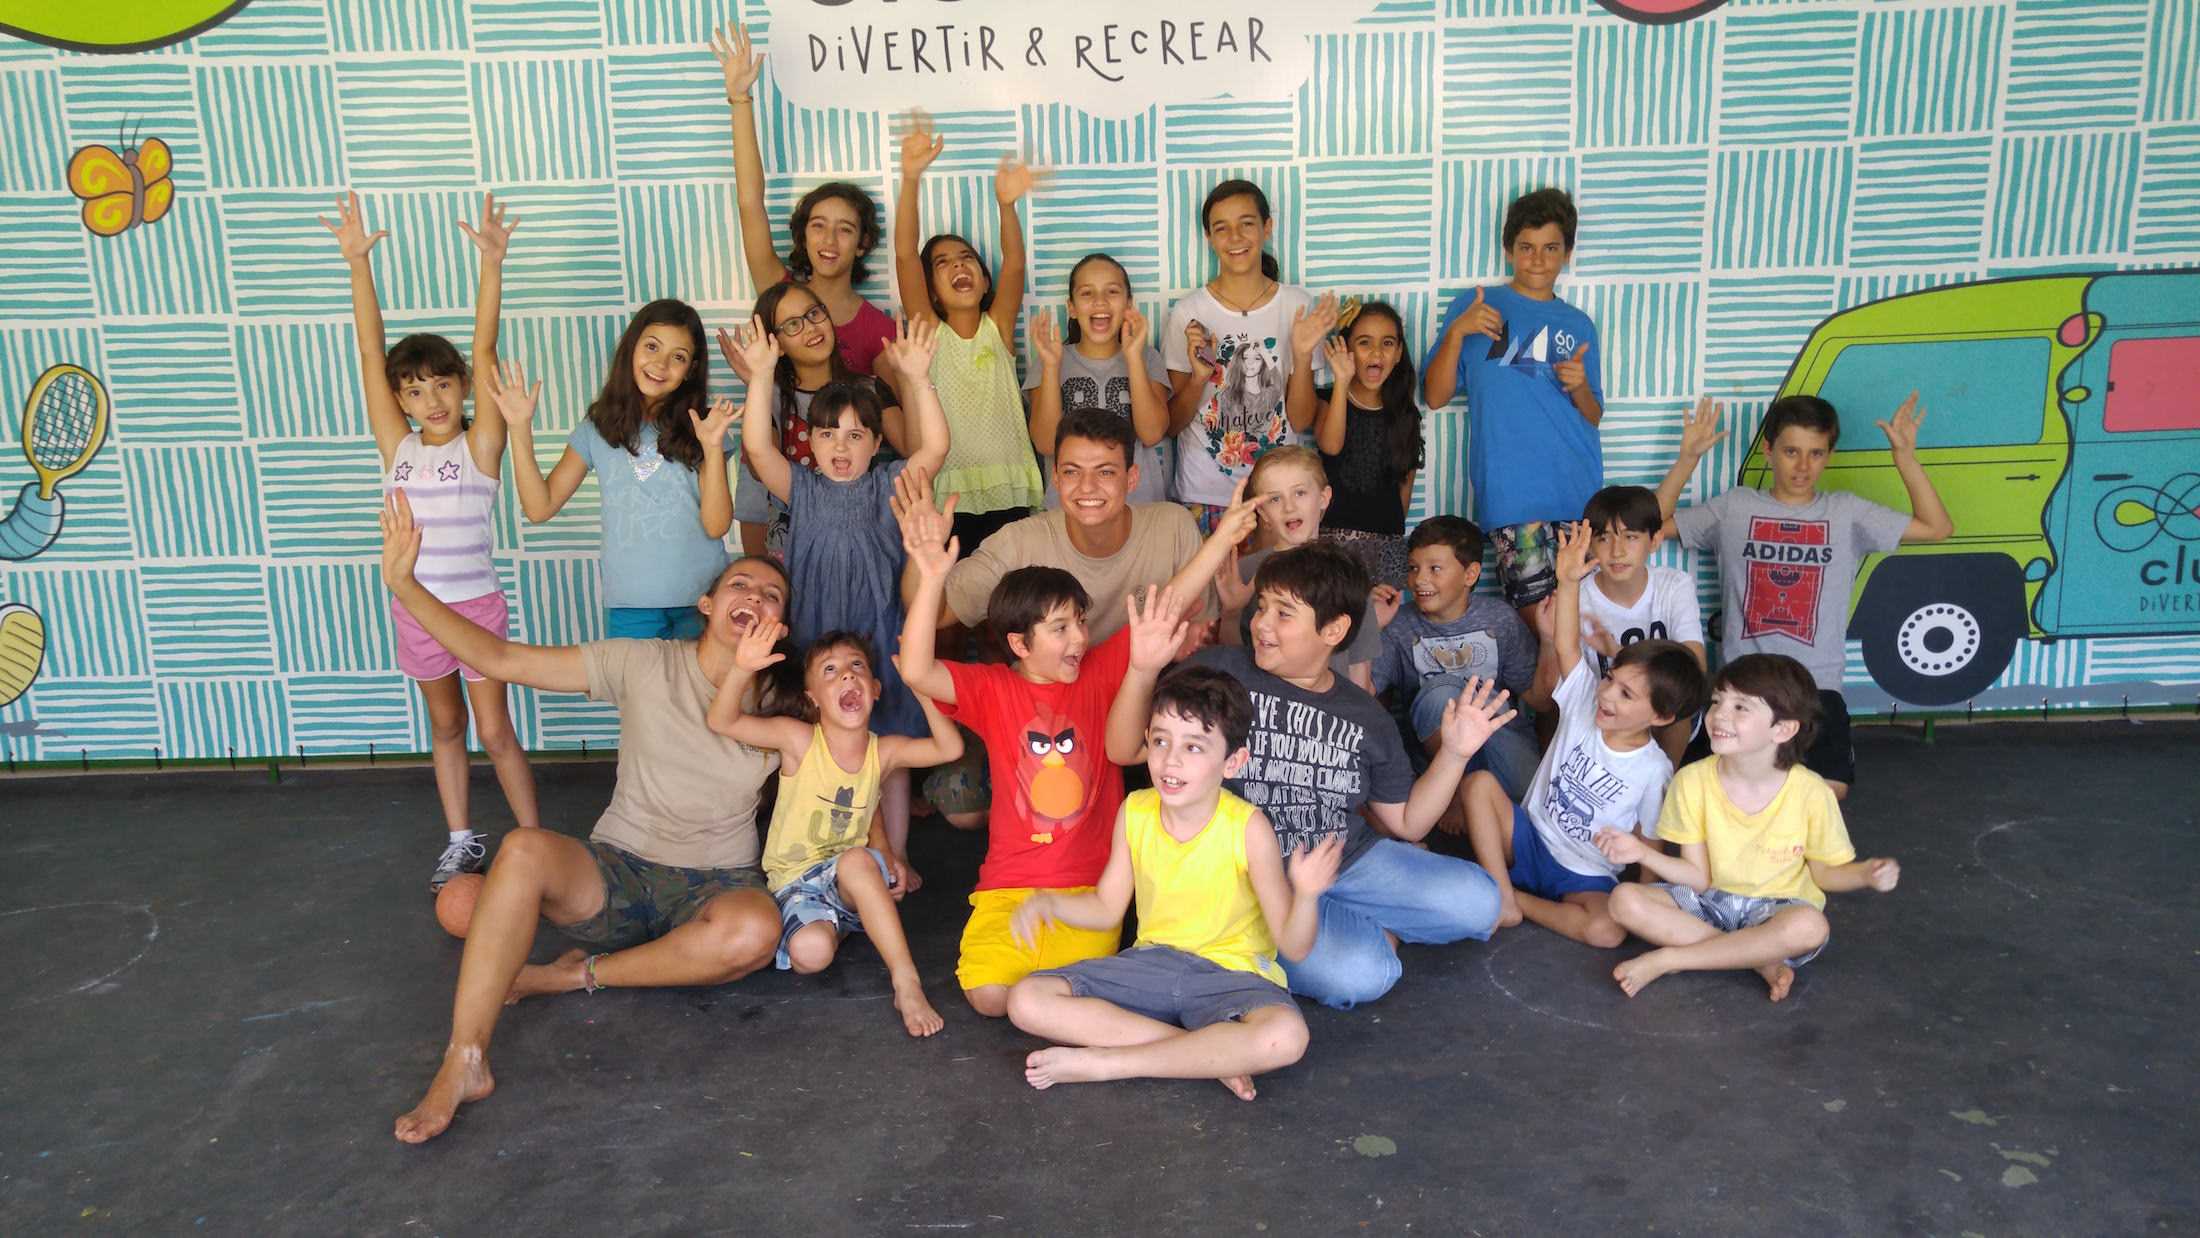 Chega de buffet infantil pasteurizado Divertir & Recrear 01